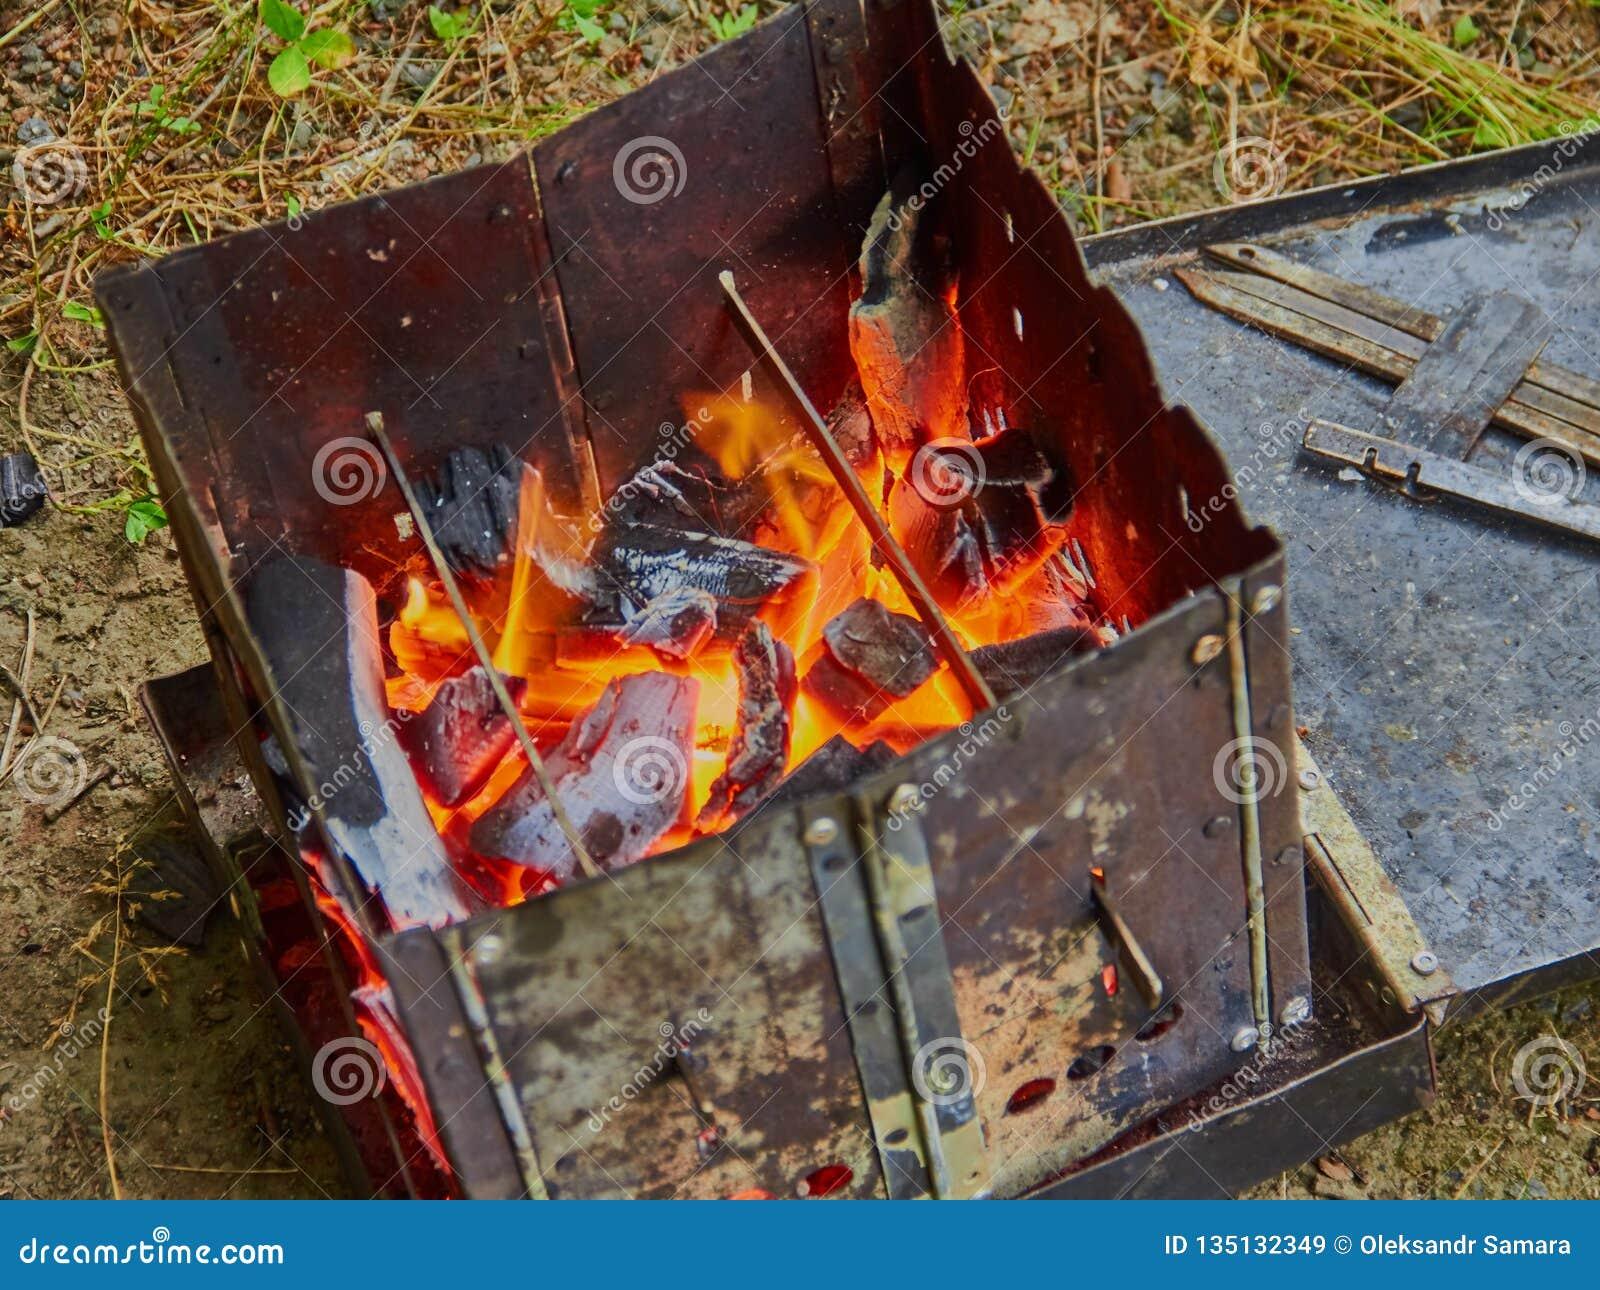 Het fornuis van de wandelingstoerist met brandstof van houten spaanders